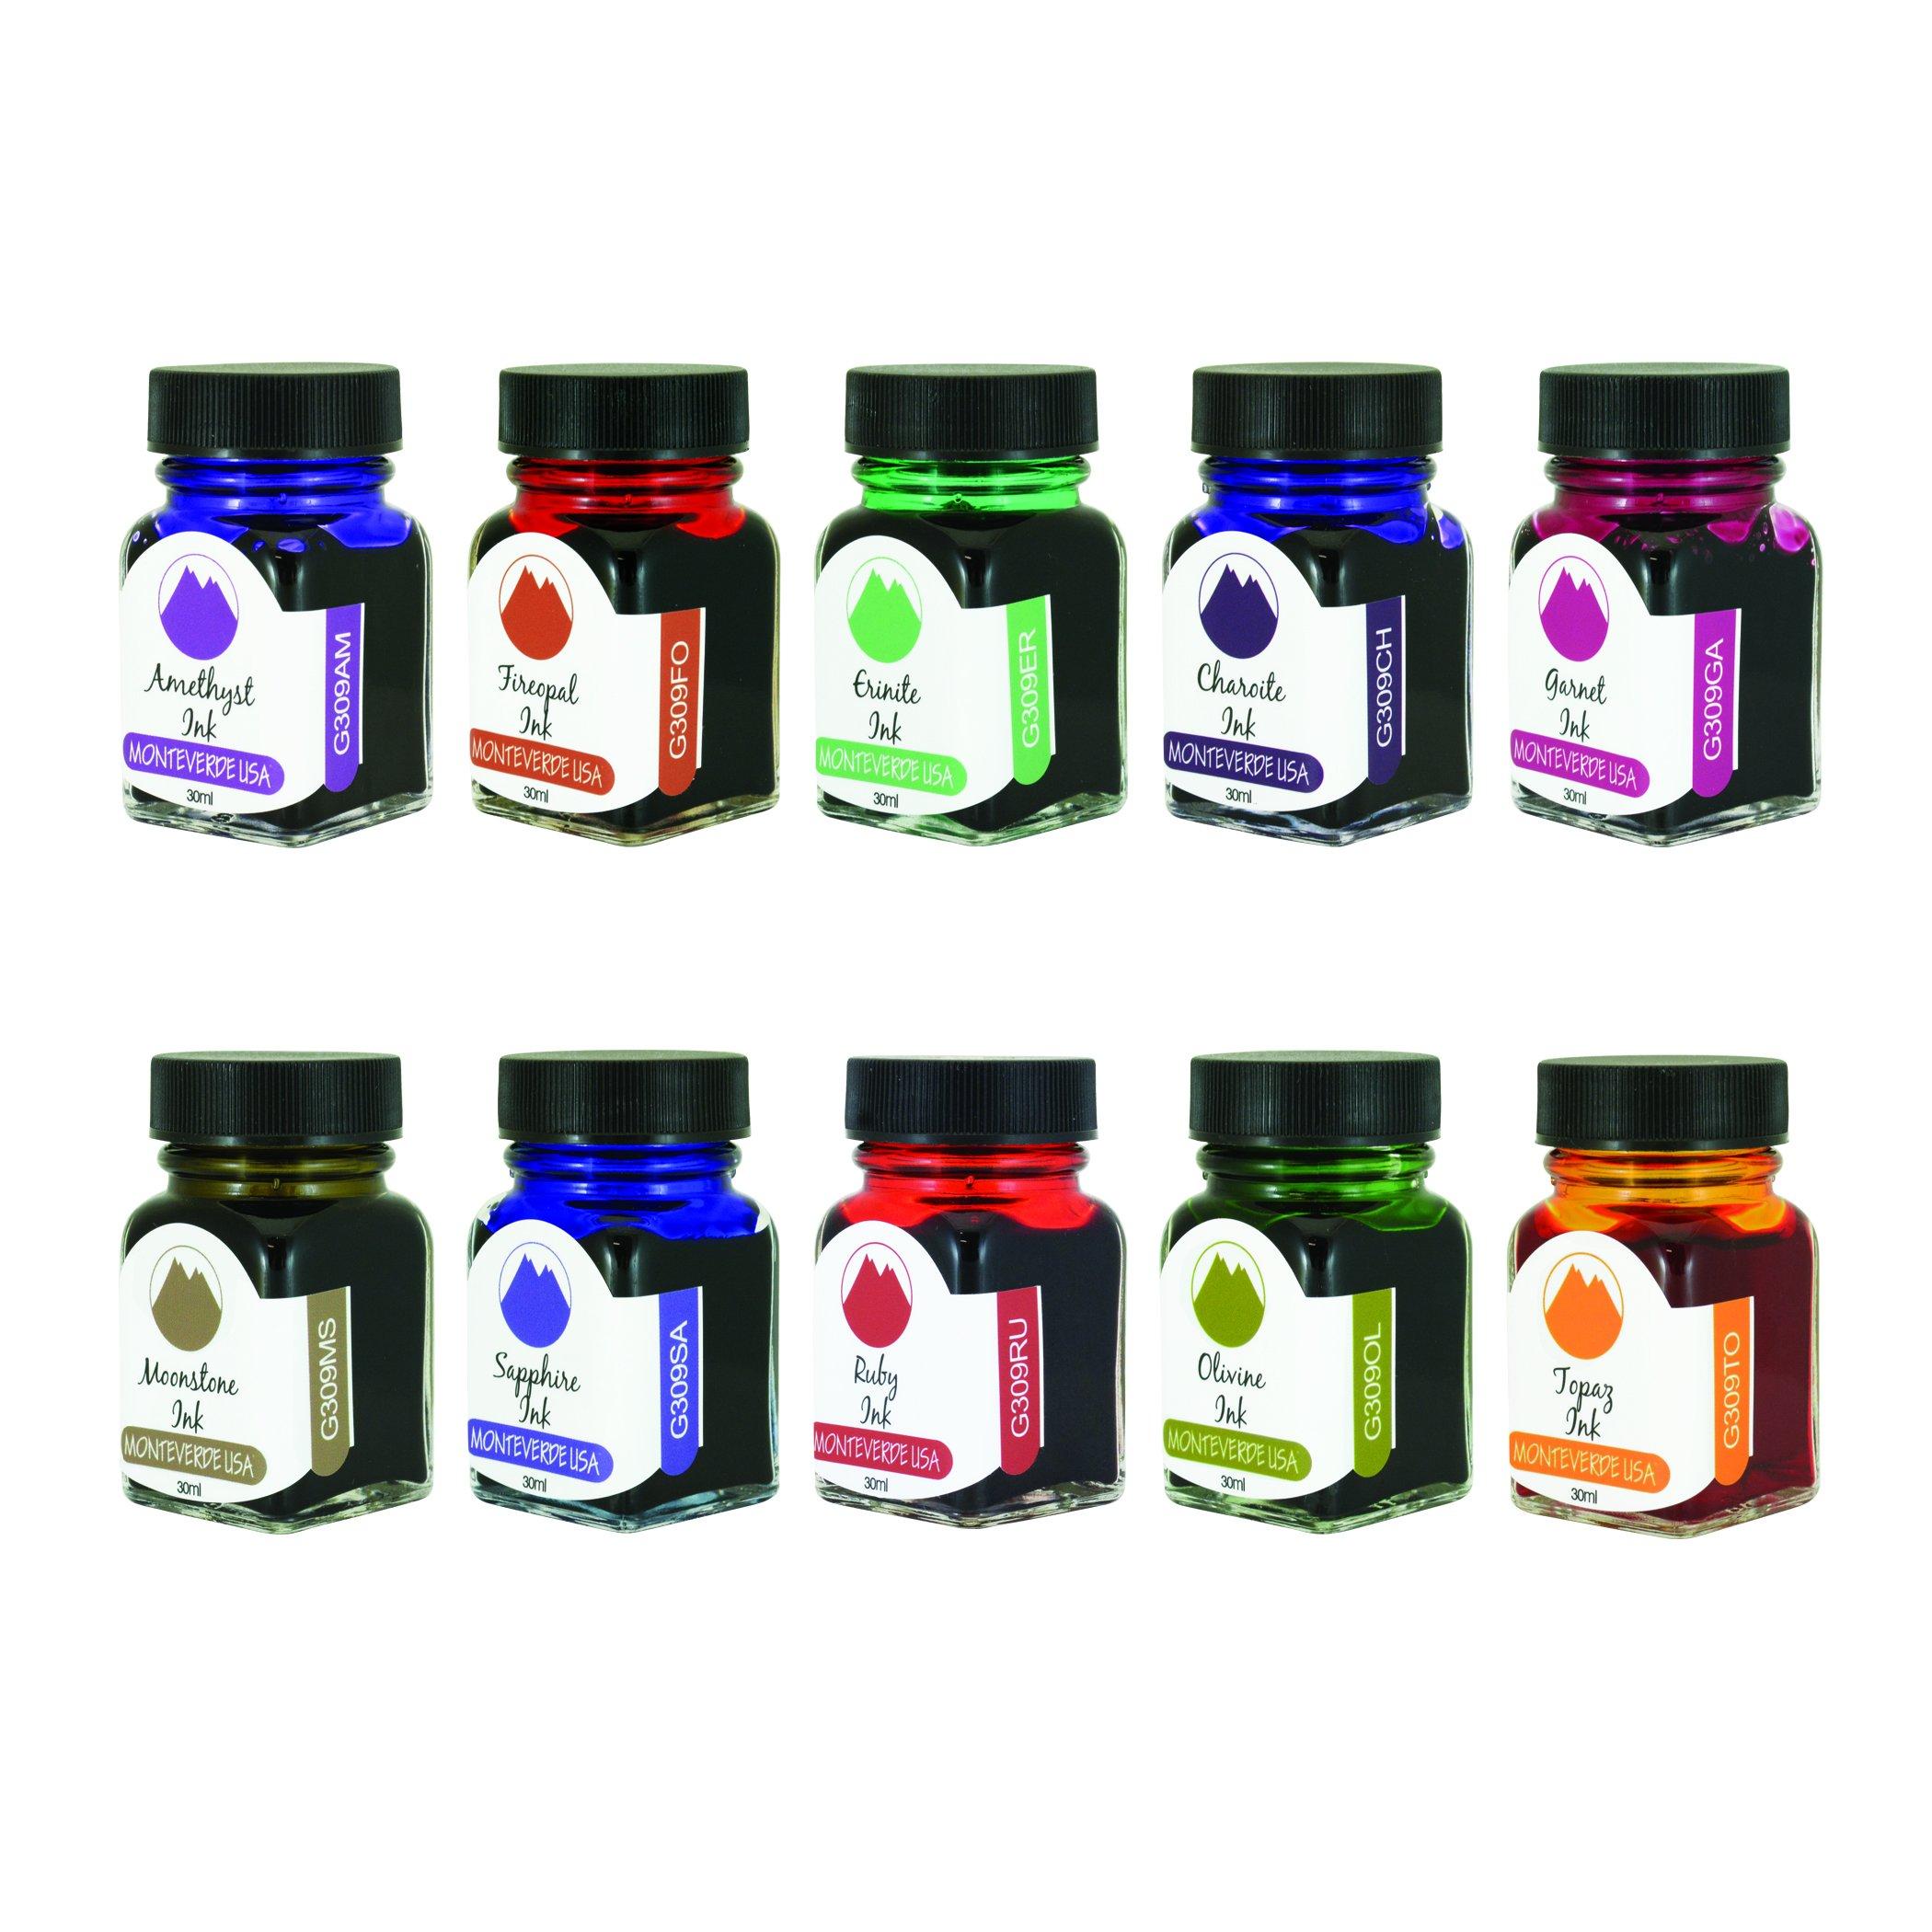 MONTEVERDE Gemstone Ink Collection Gift Set Fountain Pen Refill, Various Colors (MV12373) by Monteverde (Image #3)